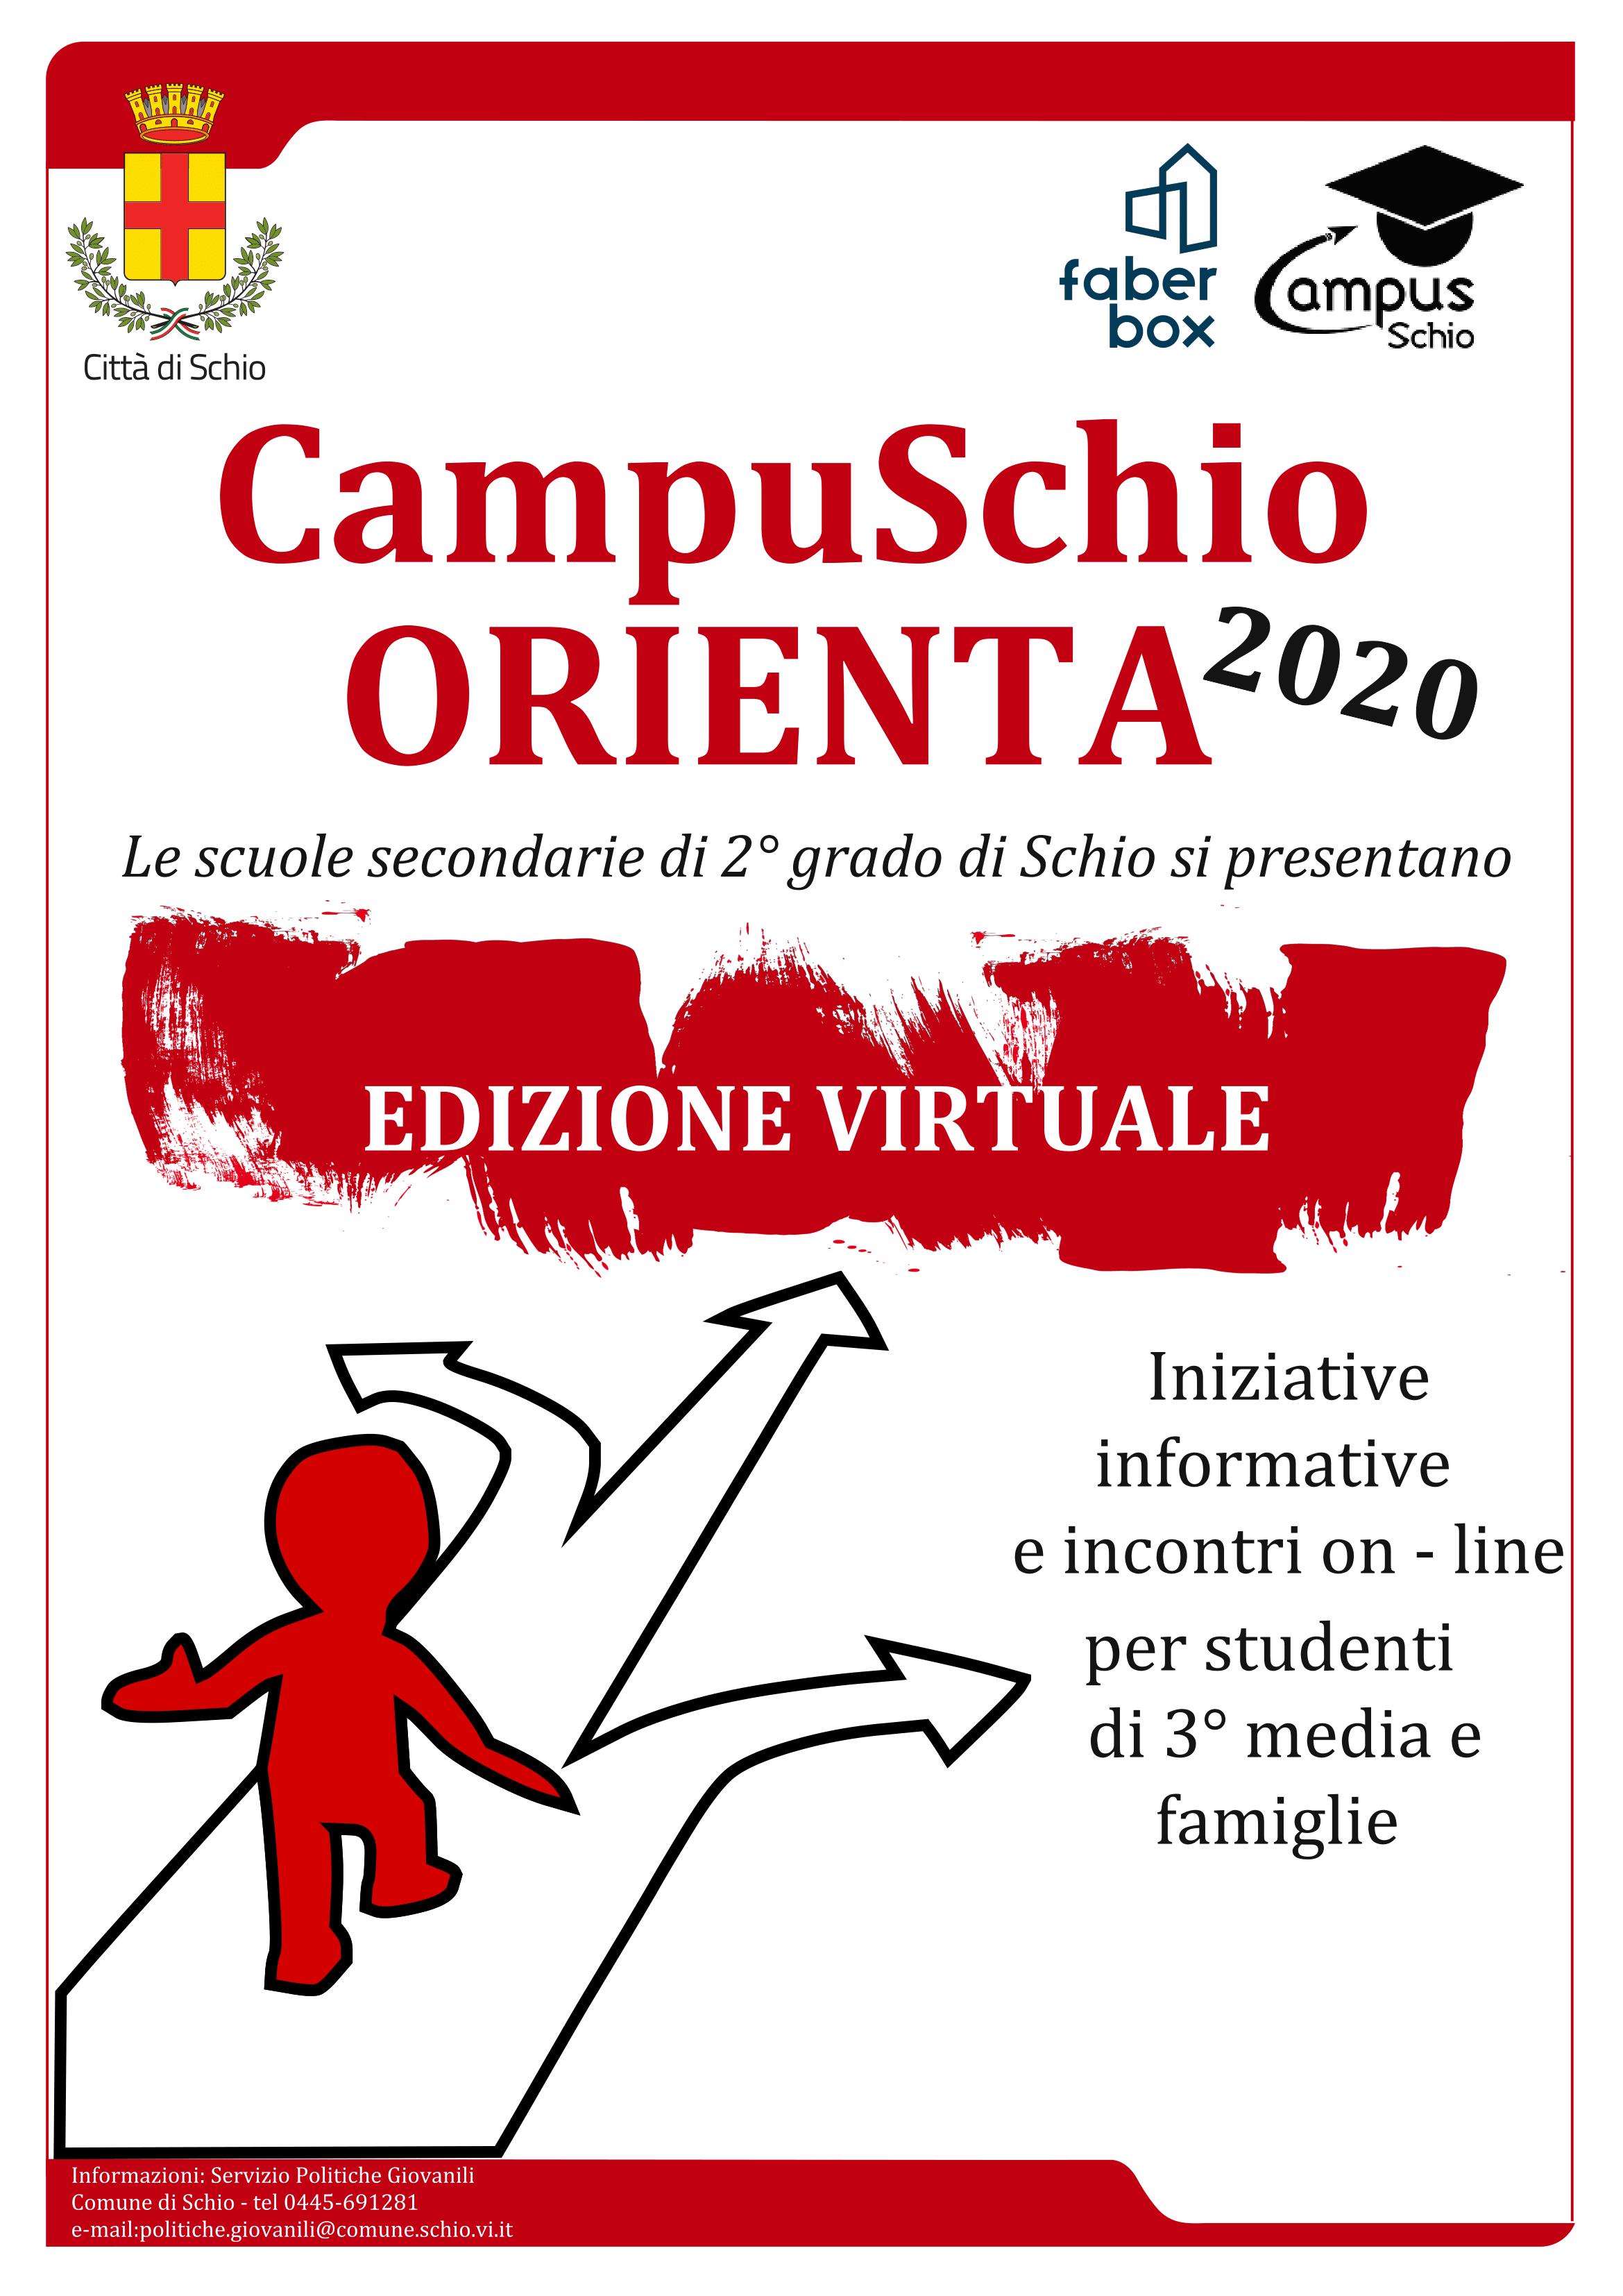 CampuSchio Orienta 2020